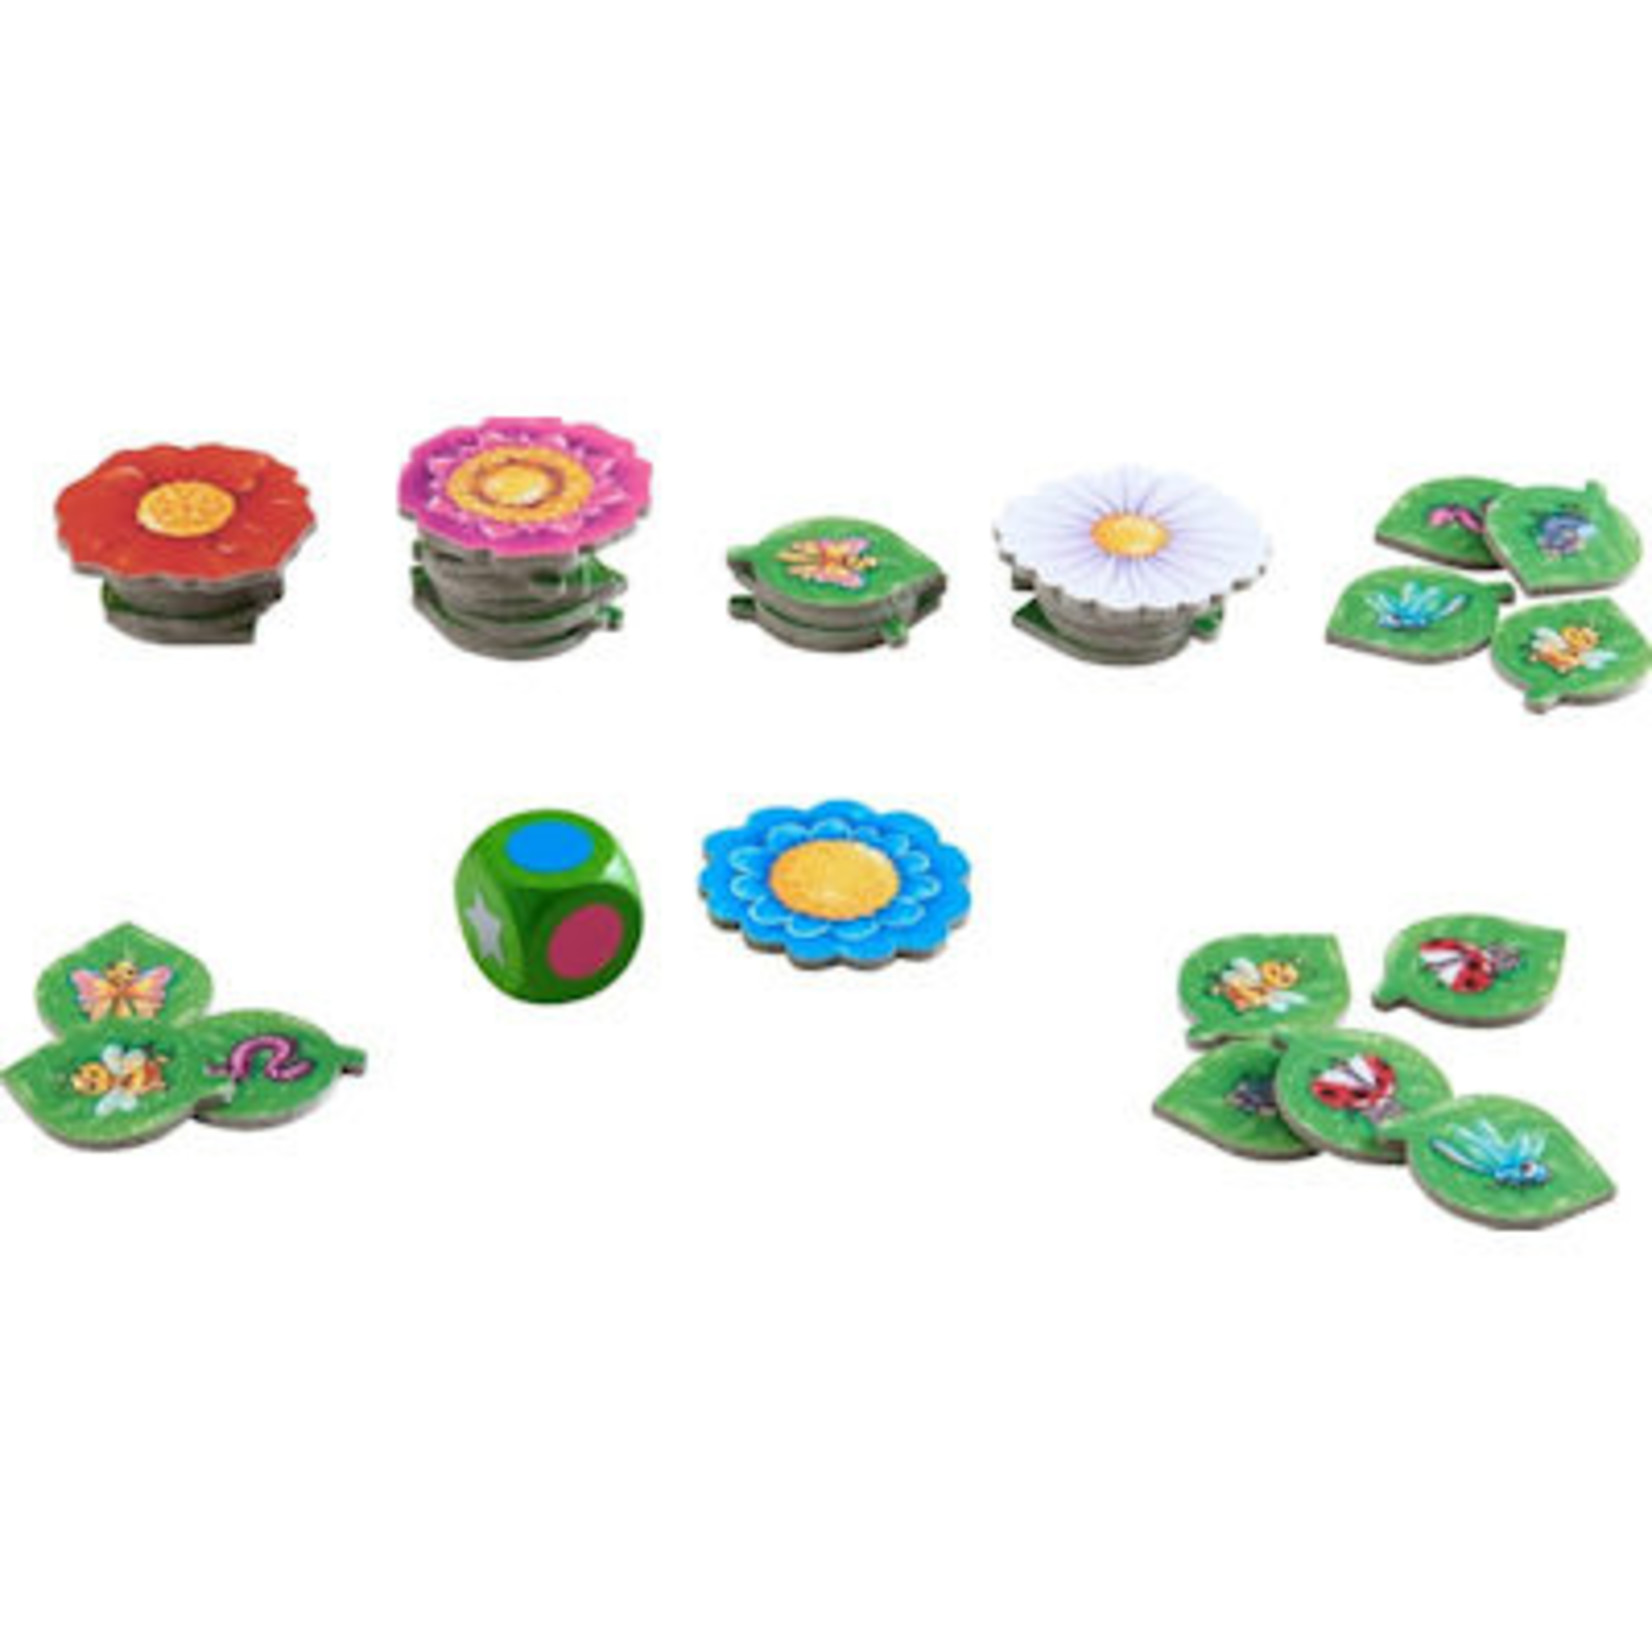 Haba Spel - Minispel Kriebelbeestjes